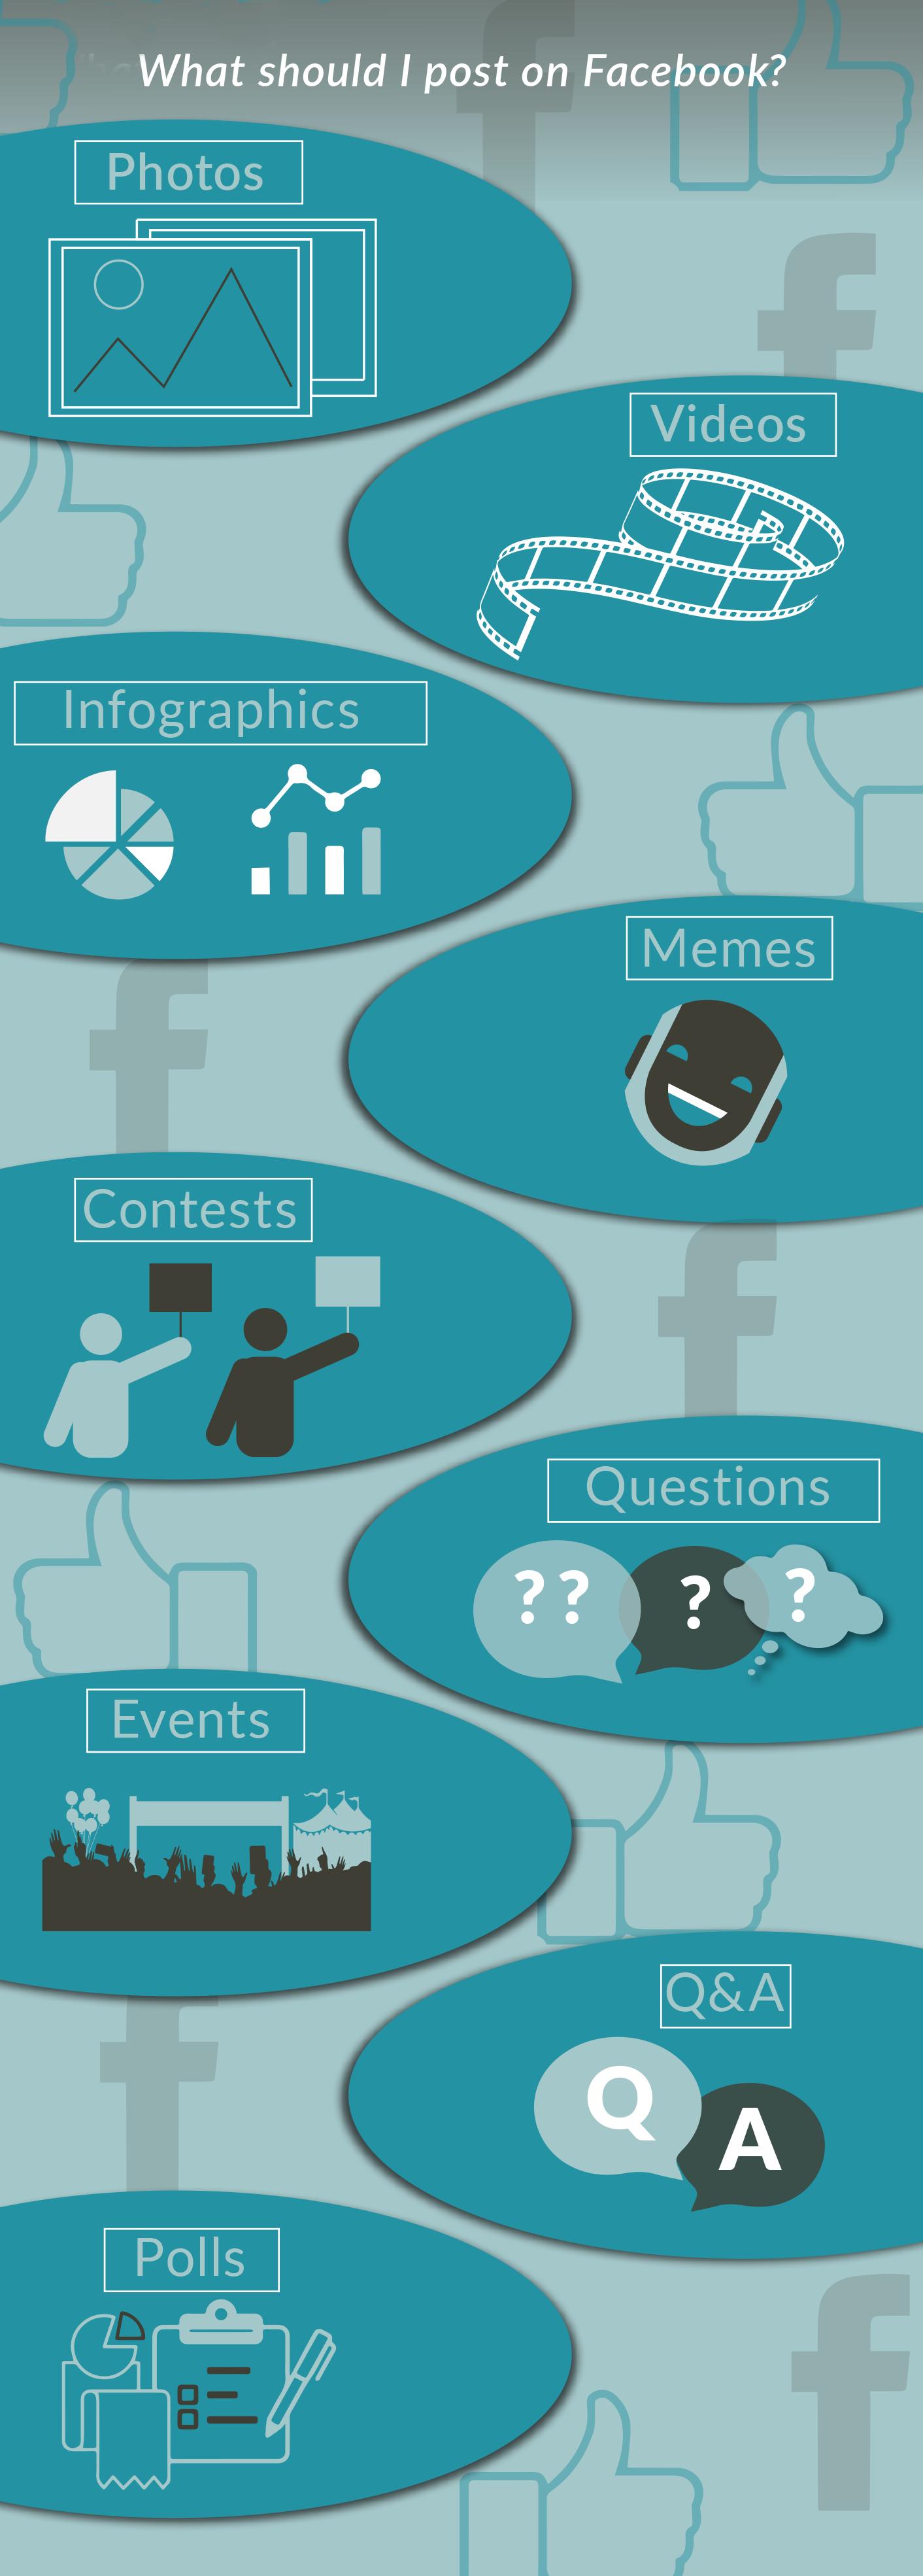 Jones-complete-social-media-guide-facebook-whattopost